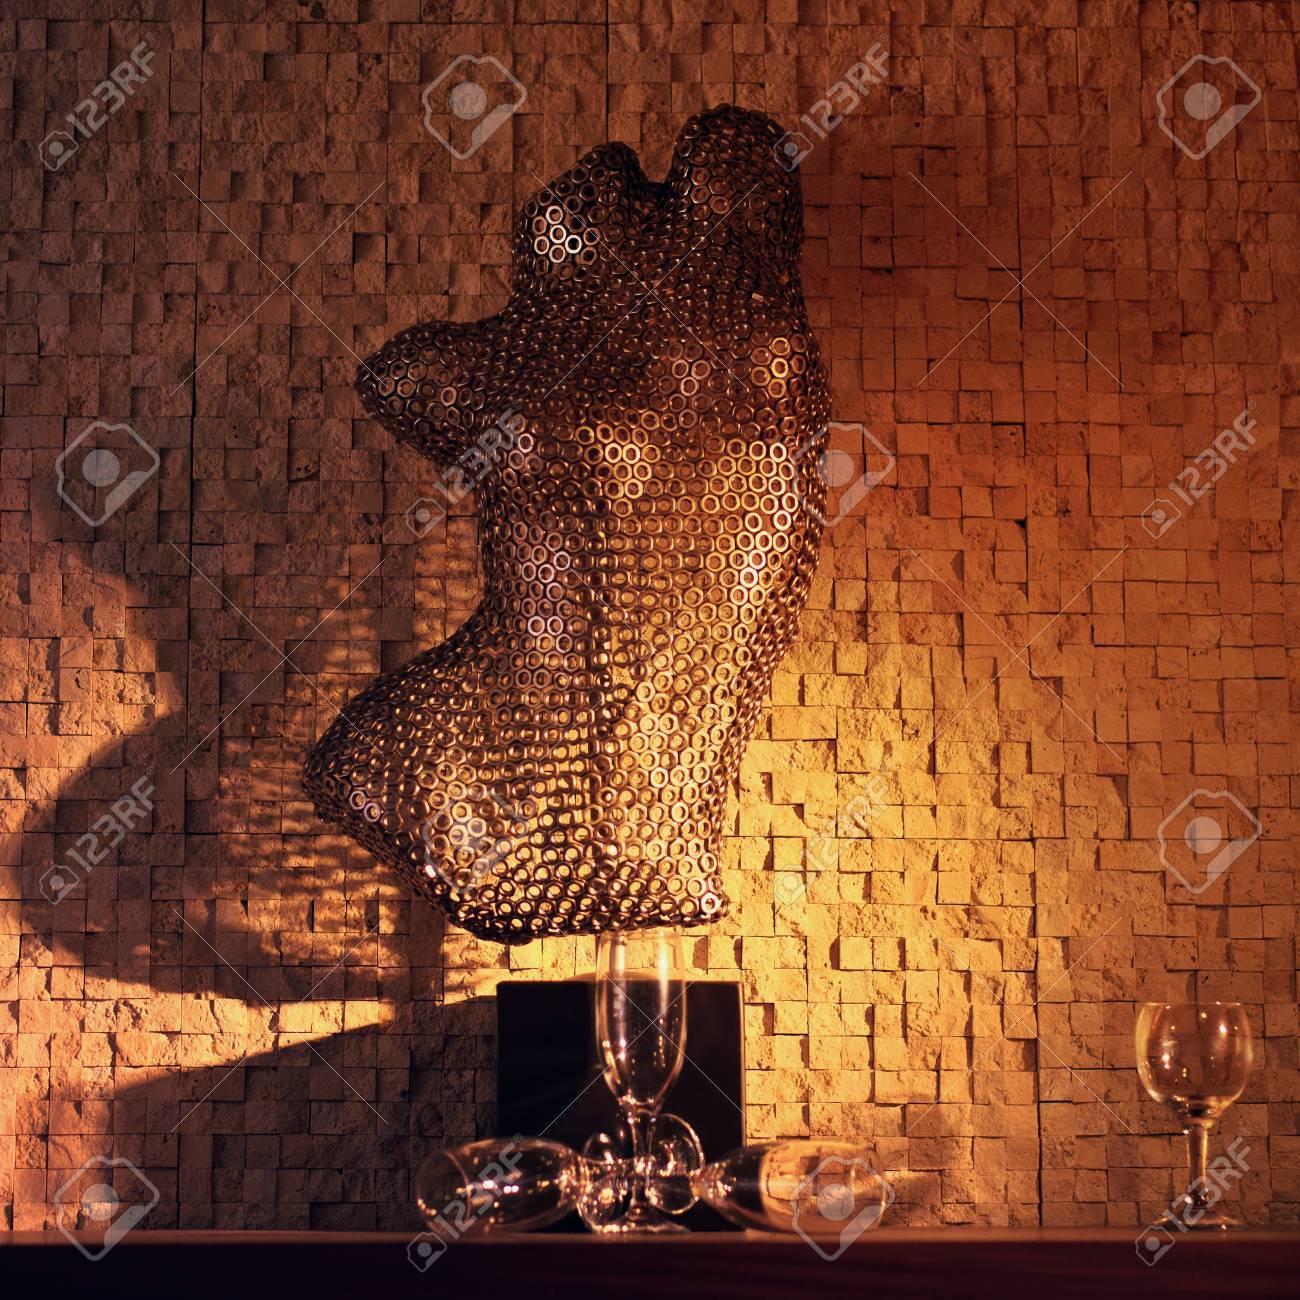 Hauberk in the interior of the bar Stock Photo - 16951012